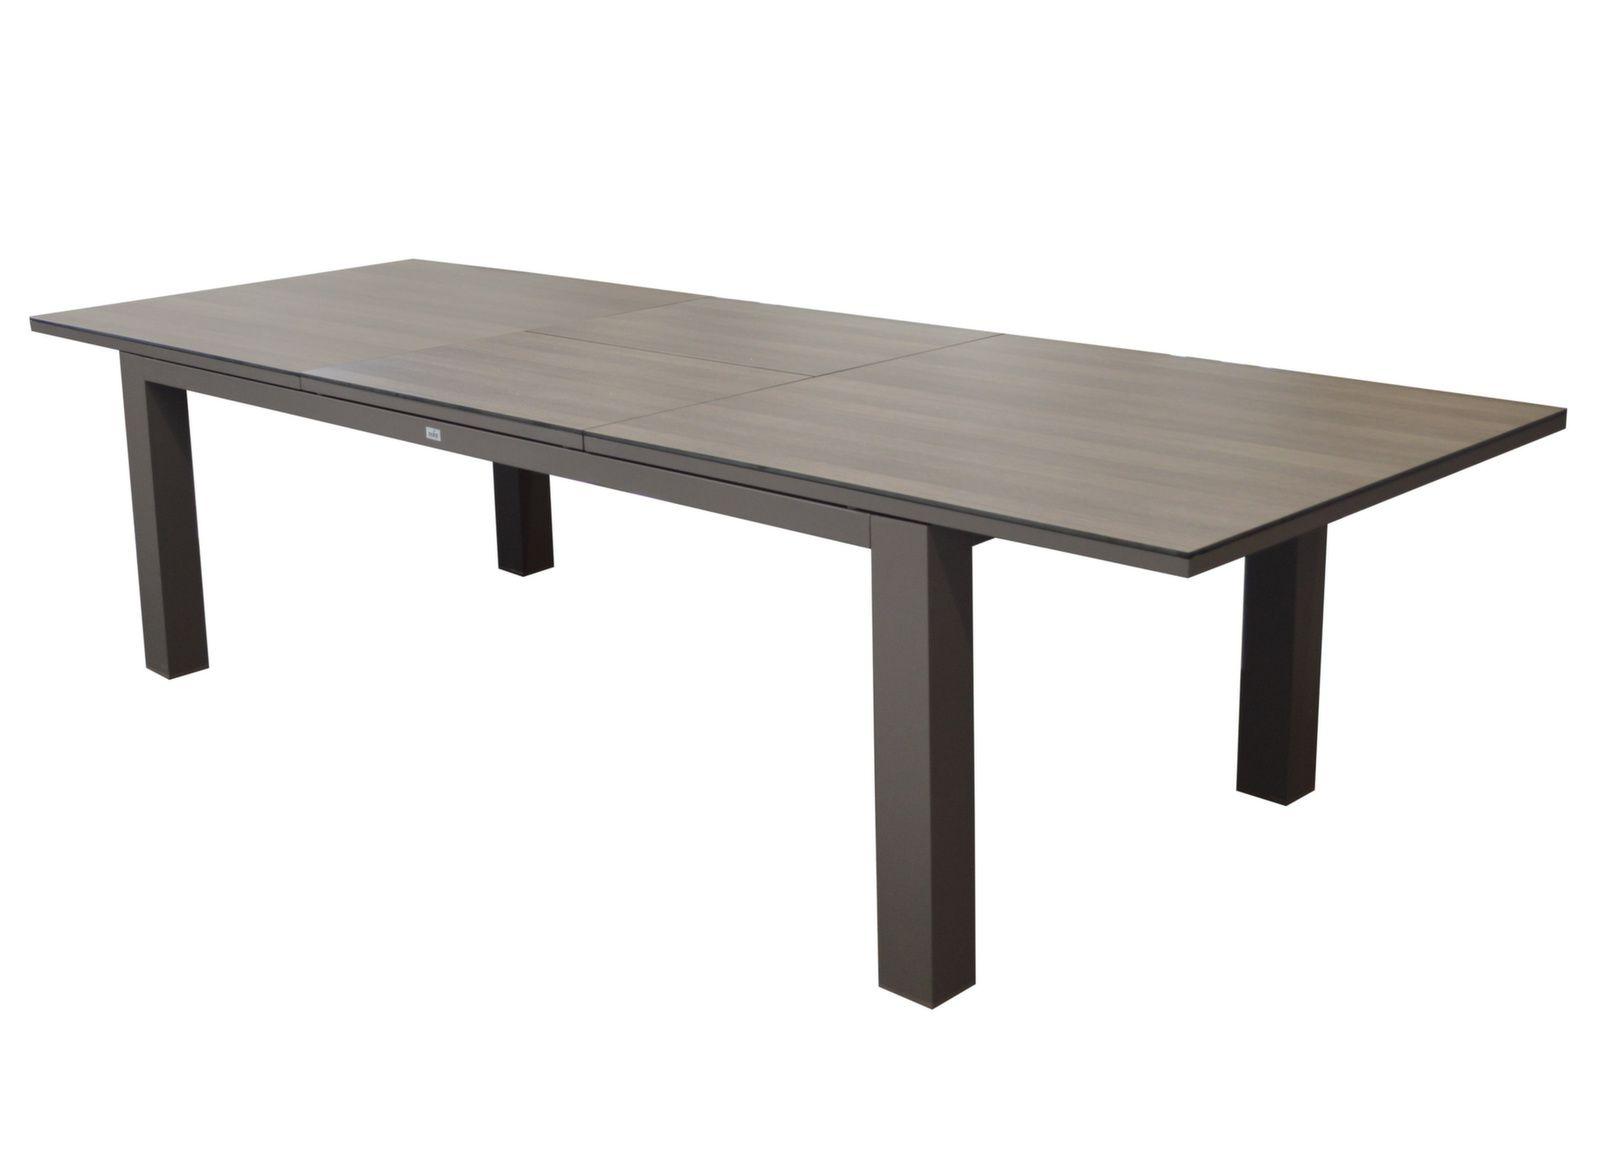 Table de jardin flo 180 240 cm plateau hpl gamme oc o for Plateau table 180